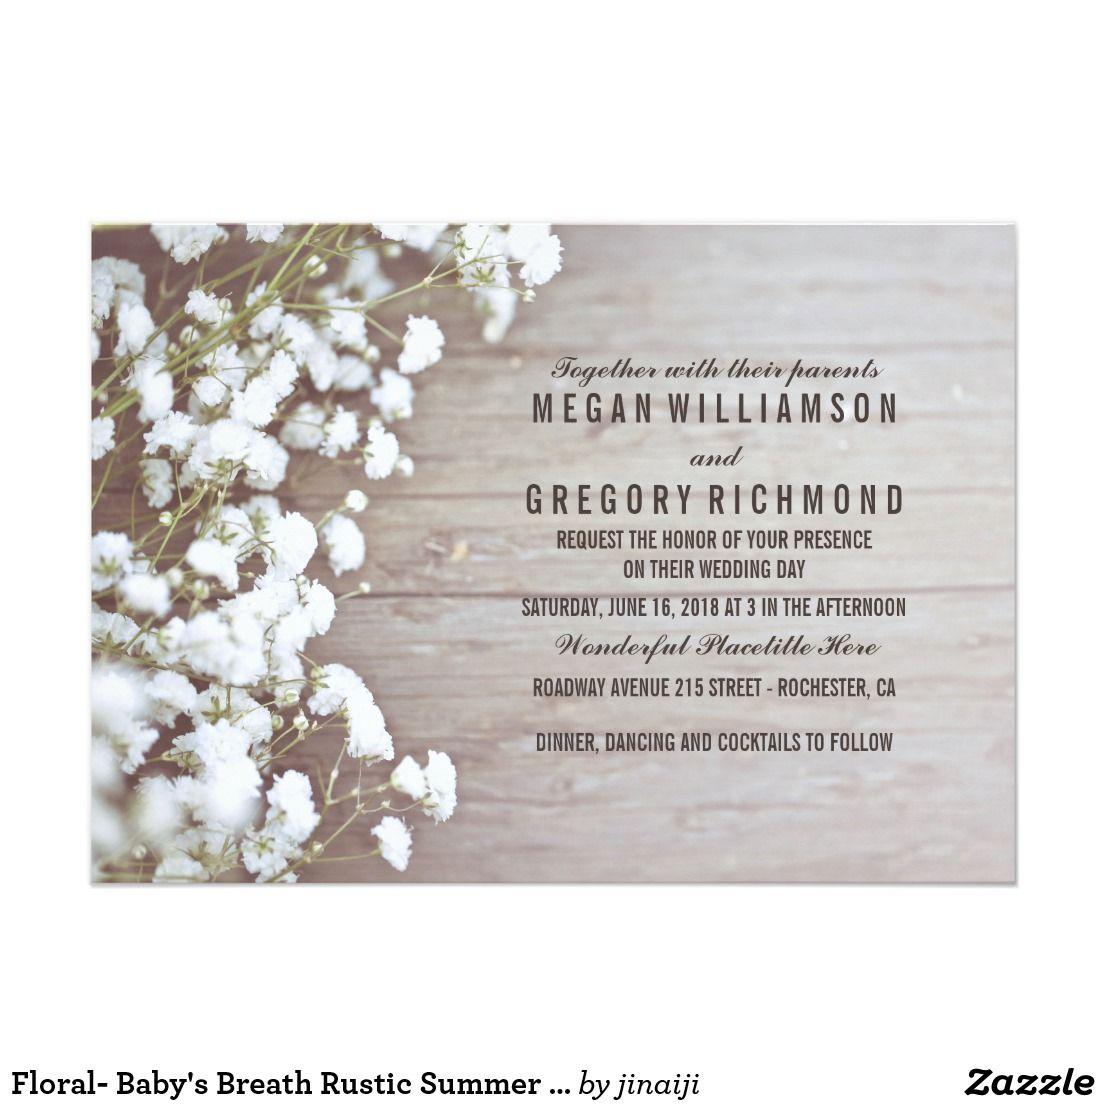 Floral Baby S Breath Rustic Summer Simple Wedding Invitation Zazzle Com Wedding Invitations Rustic Rustic Wedding Cards Simple Wedding Cards